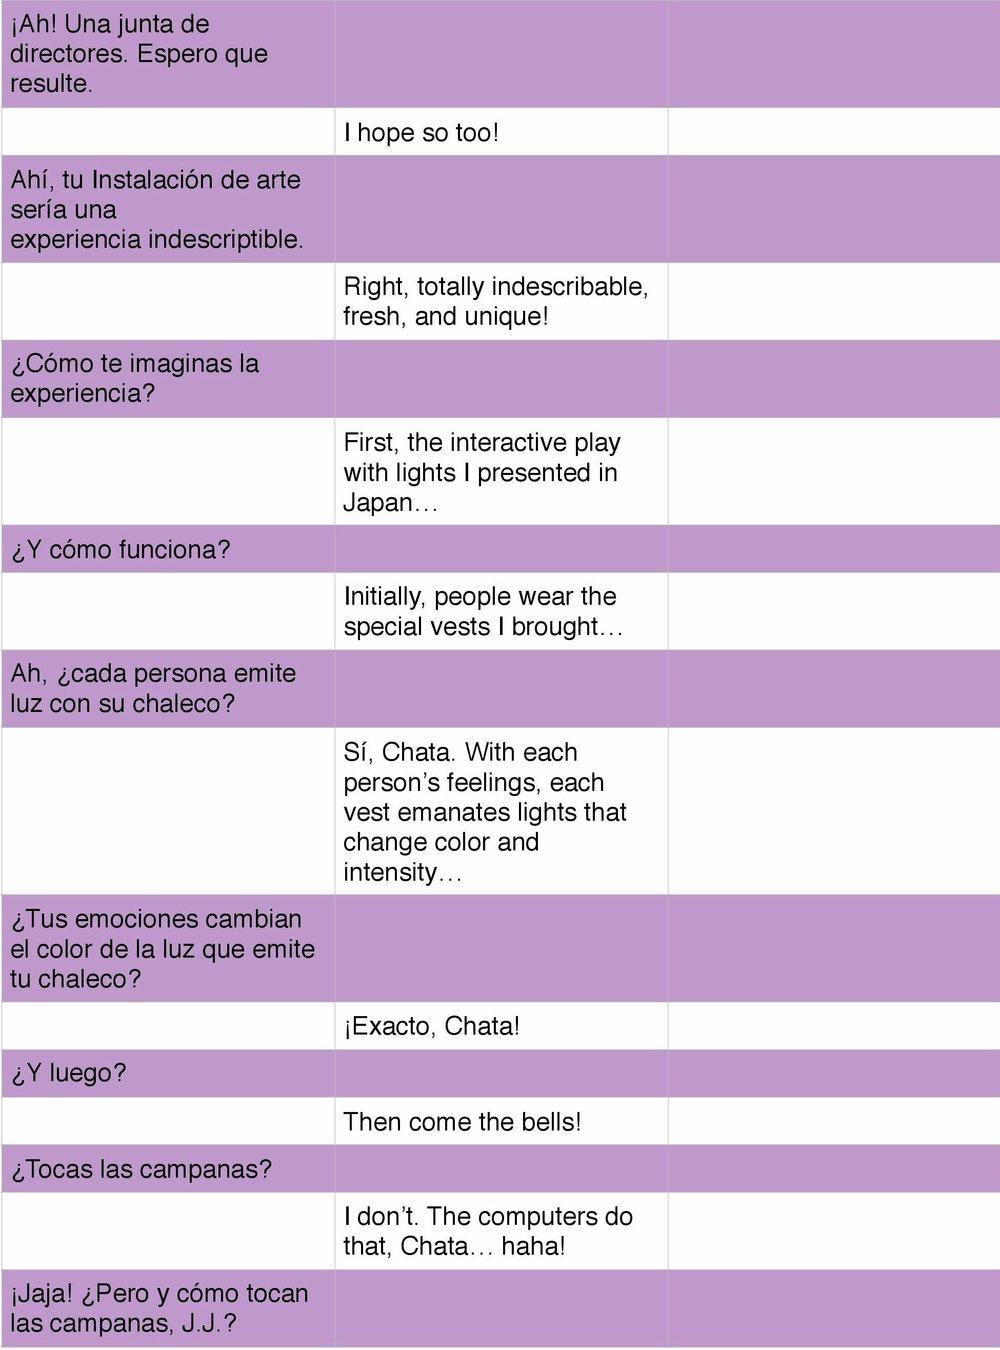 Lesson 15 Script-4.jpg